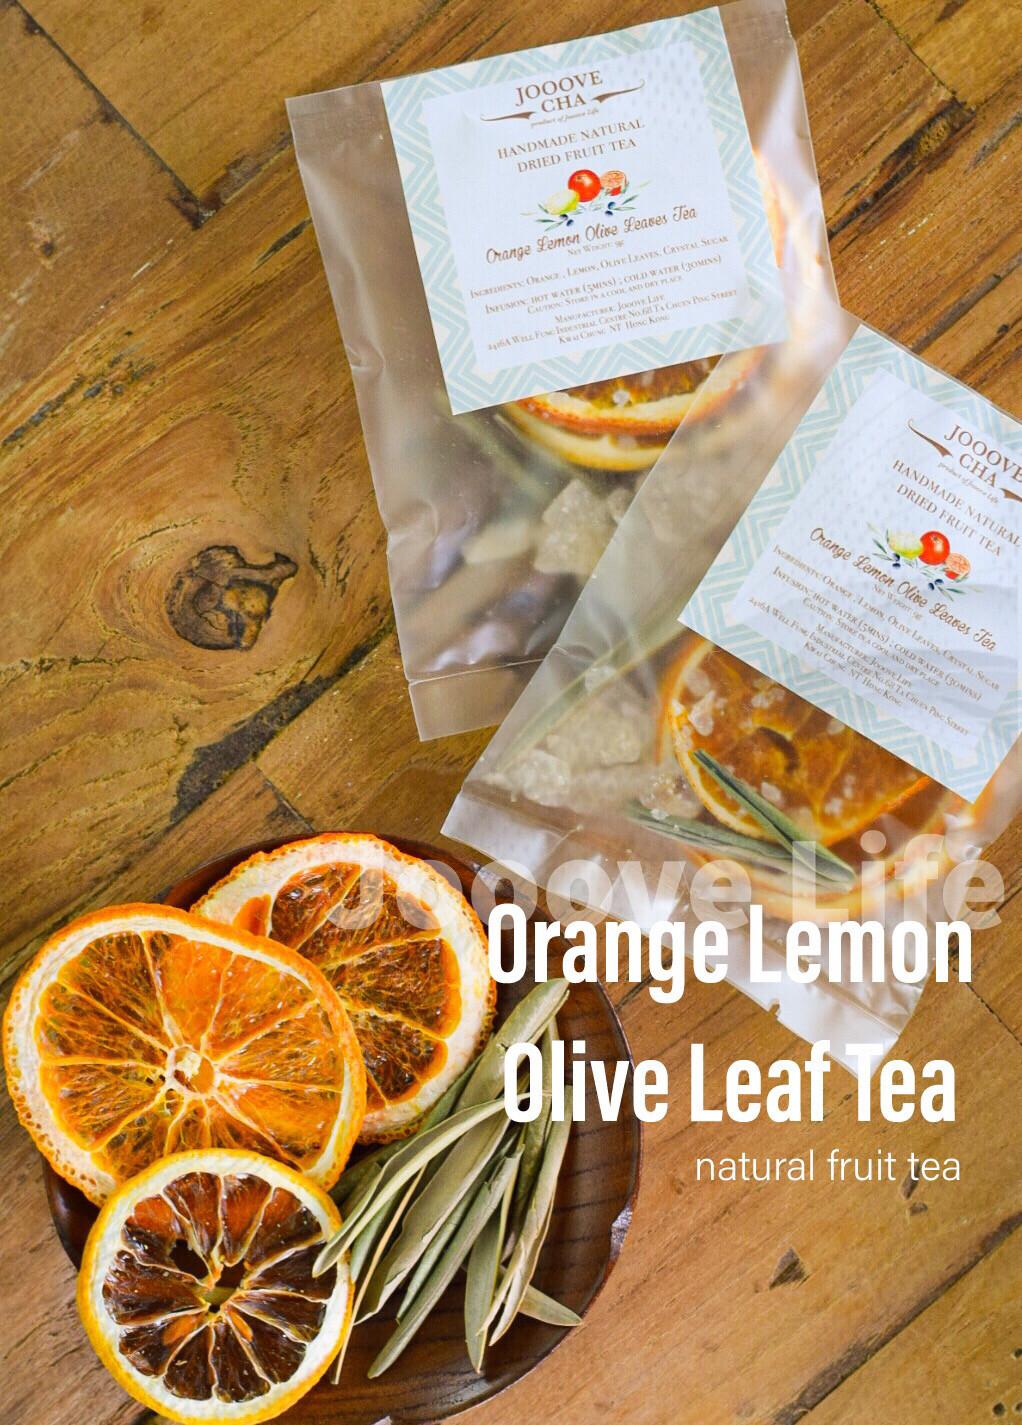 【特價】香橙檸檬橄欖葉茶 Orange Lemon Olive Leaves Tea (Best before date 30/4/21-30/6/21)